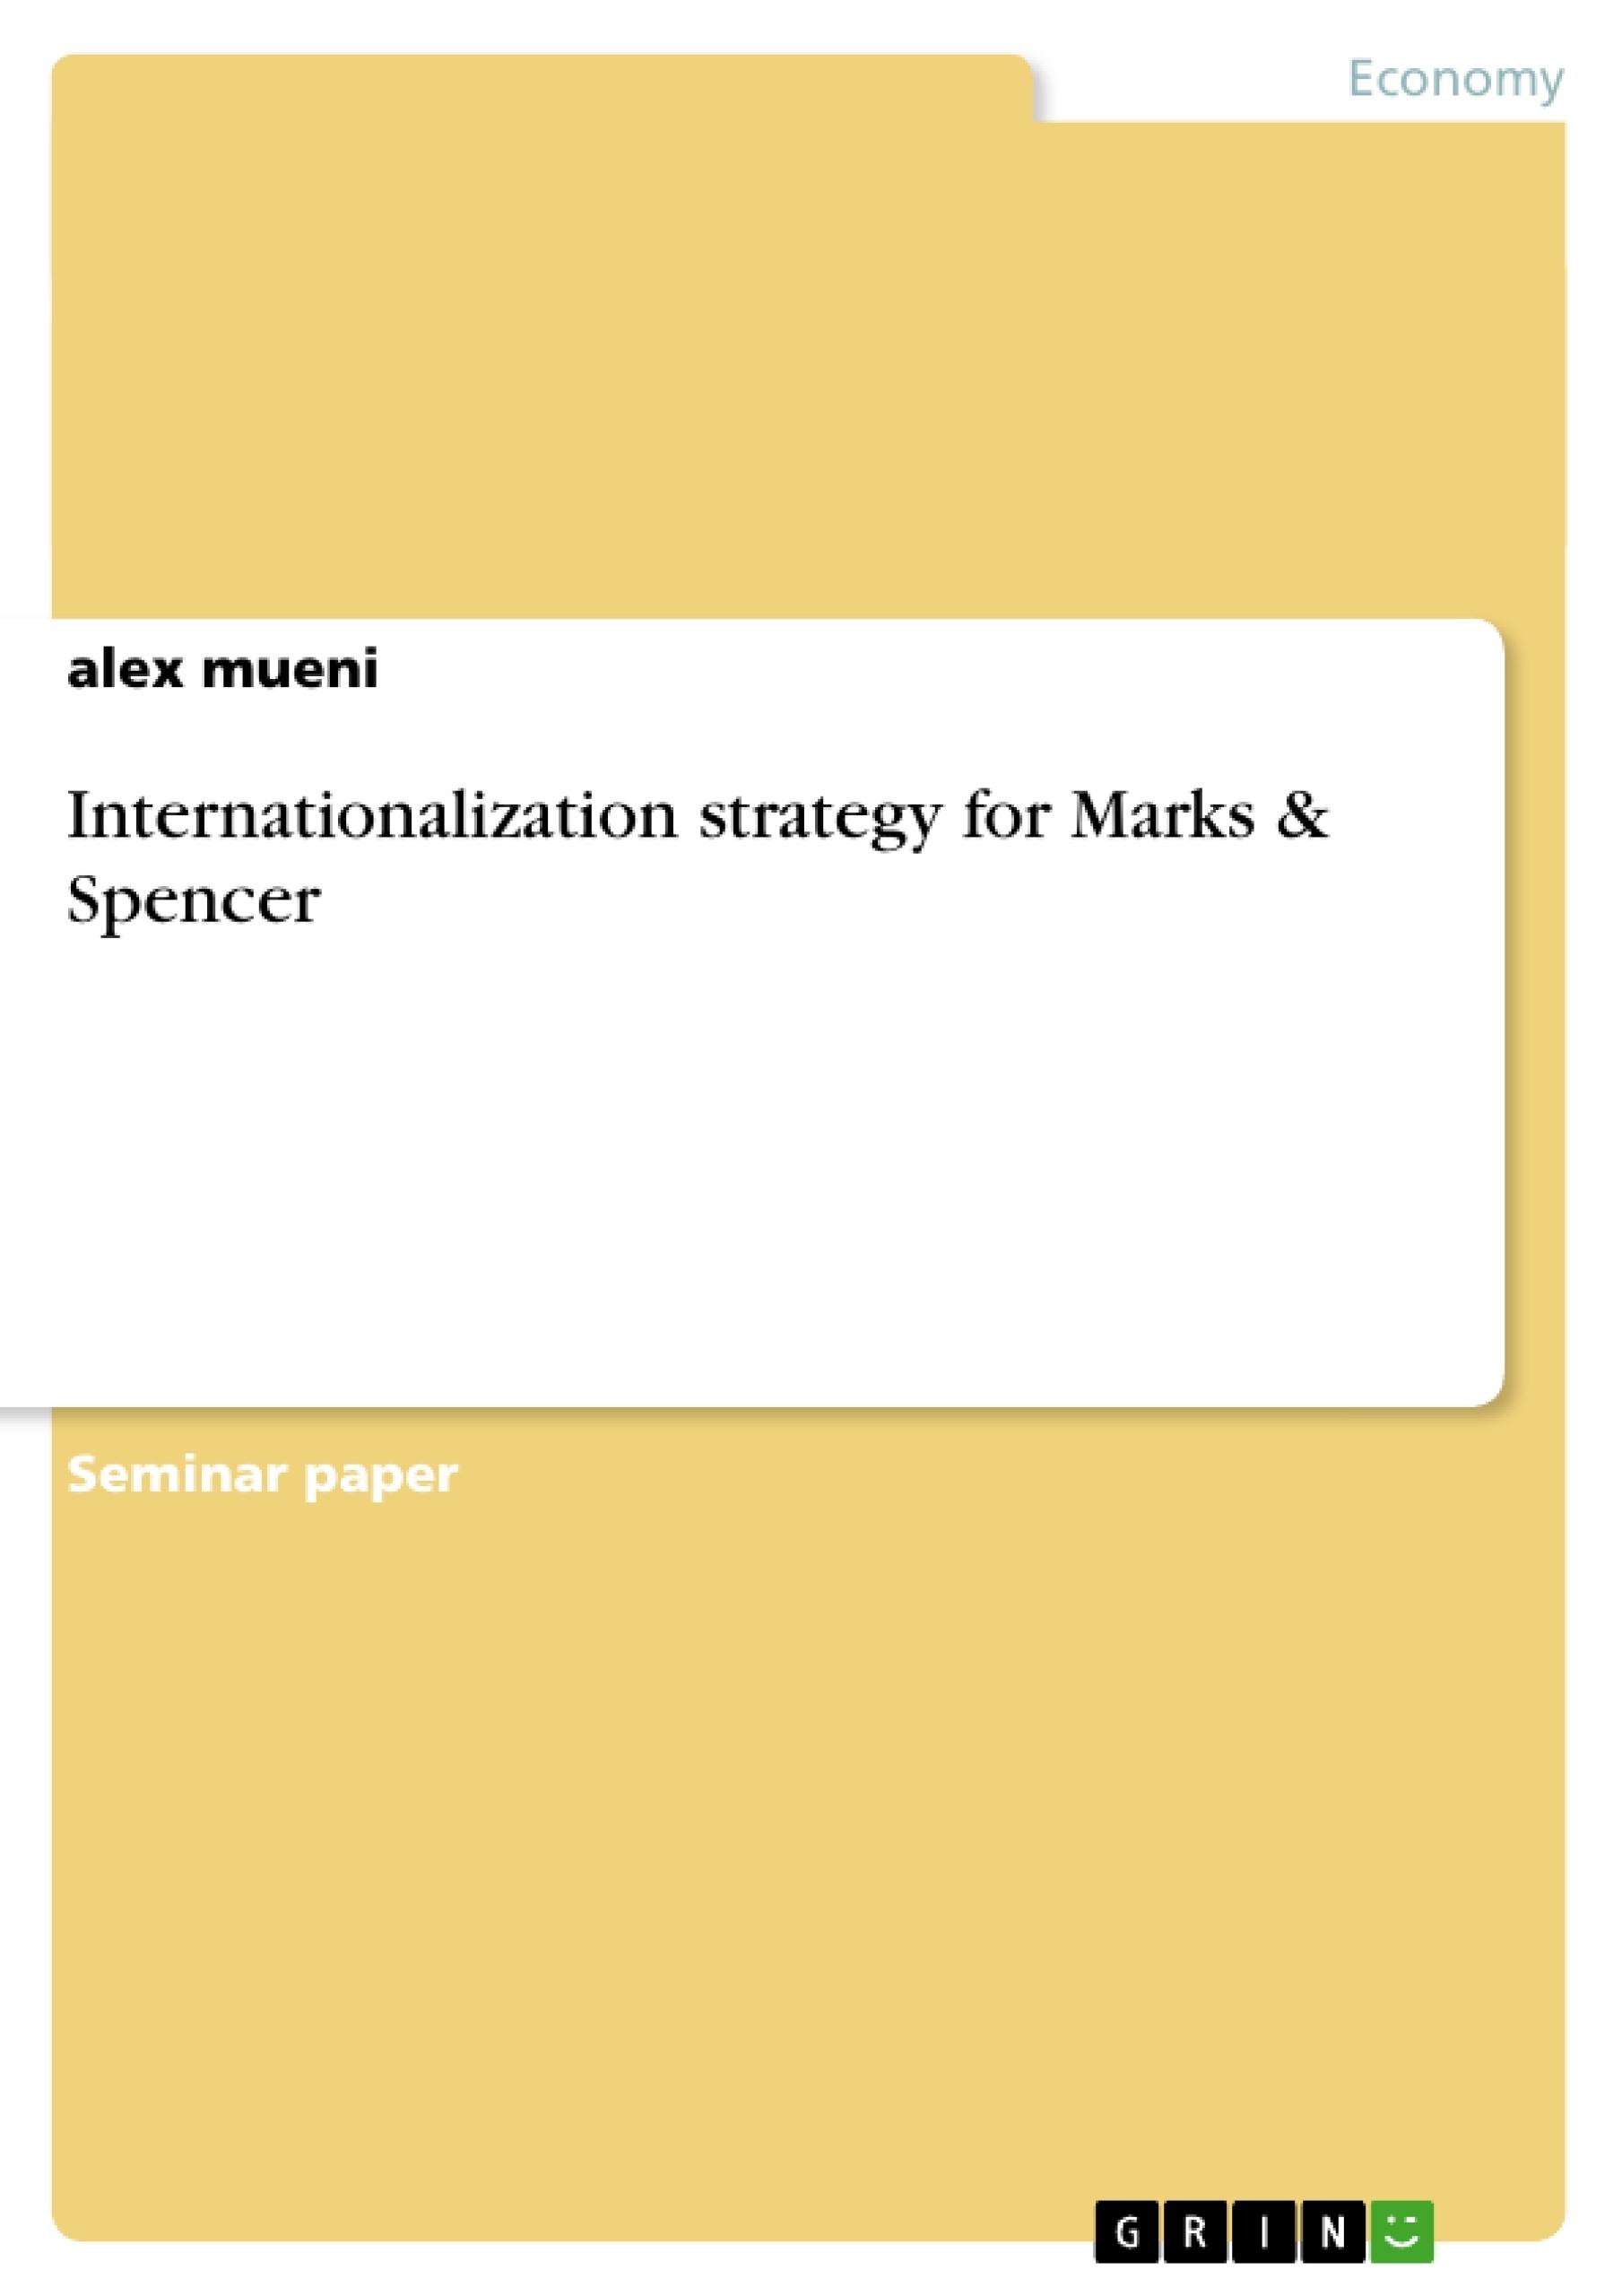 Title: Internationalization strategy for Marks & Spencer